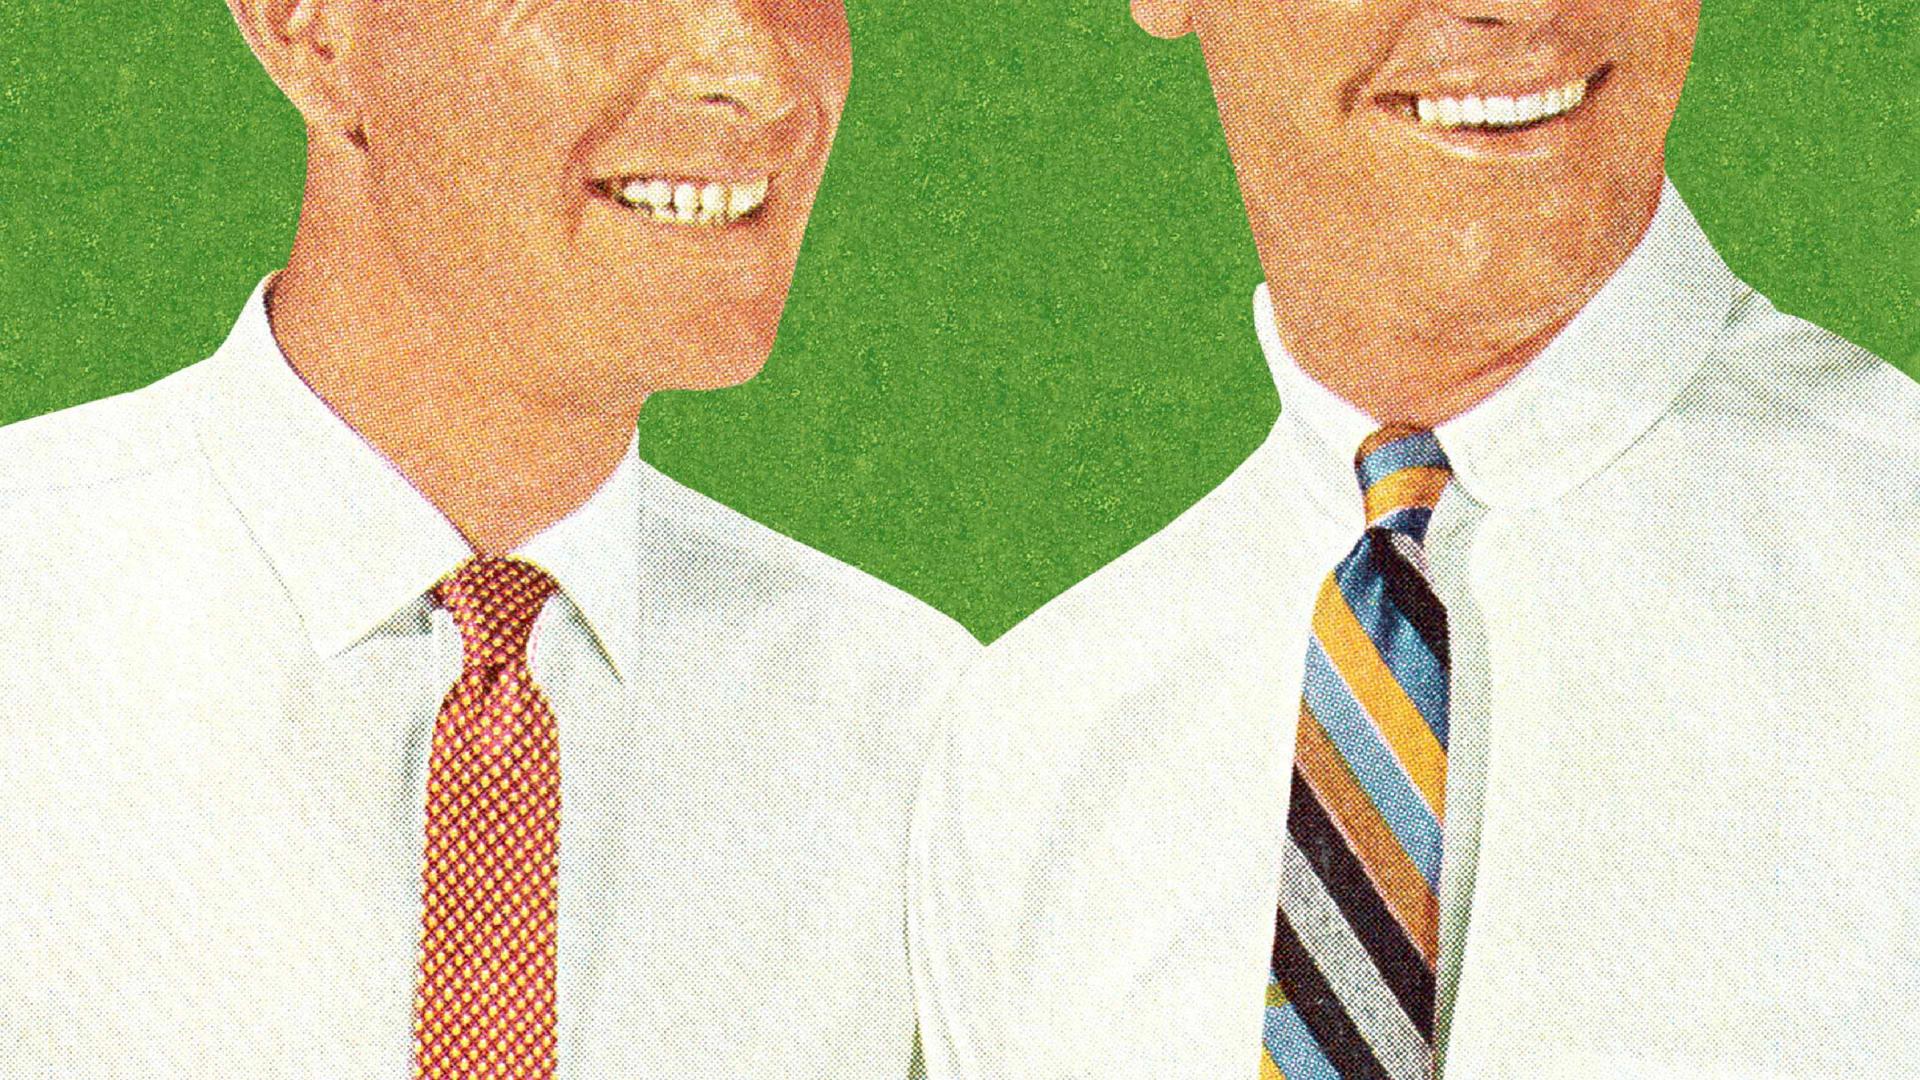 Ignore 'Happiest Jobs' Lists: A Harvard Professor Explains the 2 Factors That Really Make for a Happy Job